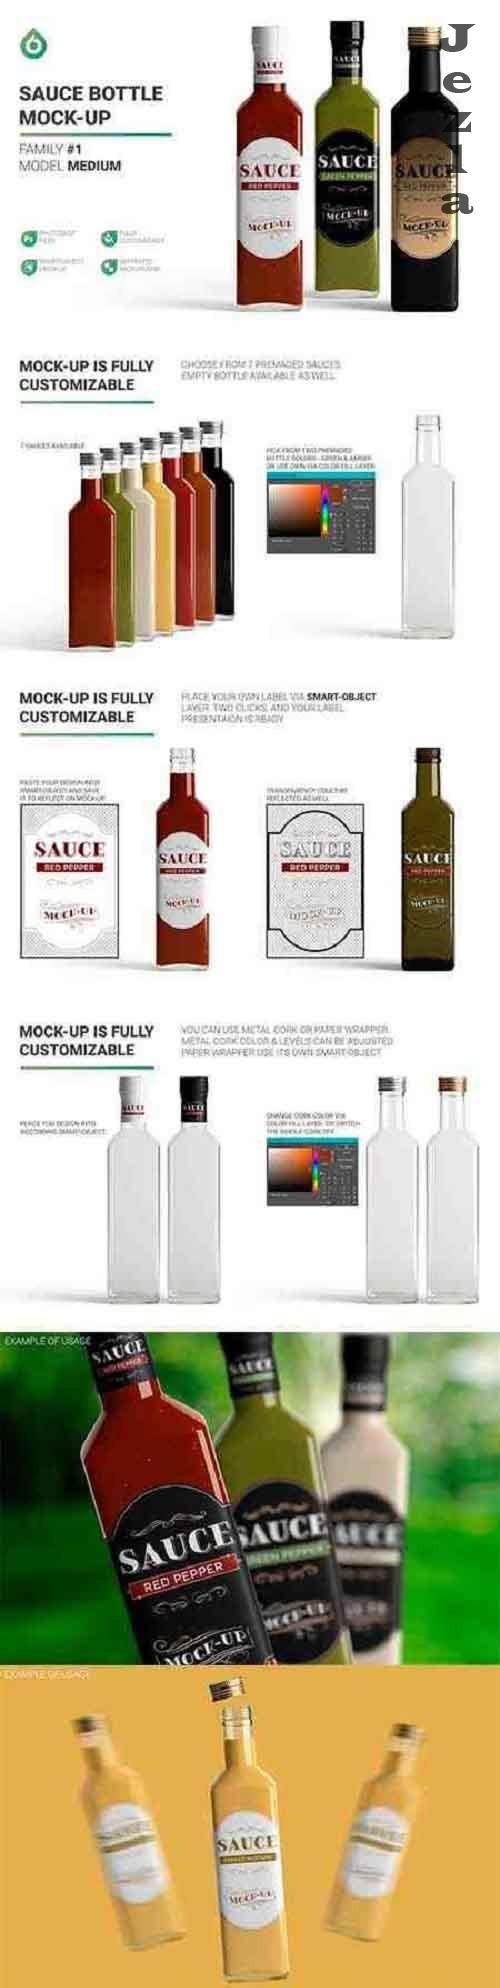 Sauce Bottle Mockup 4834491